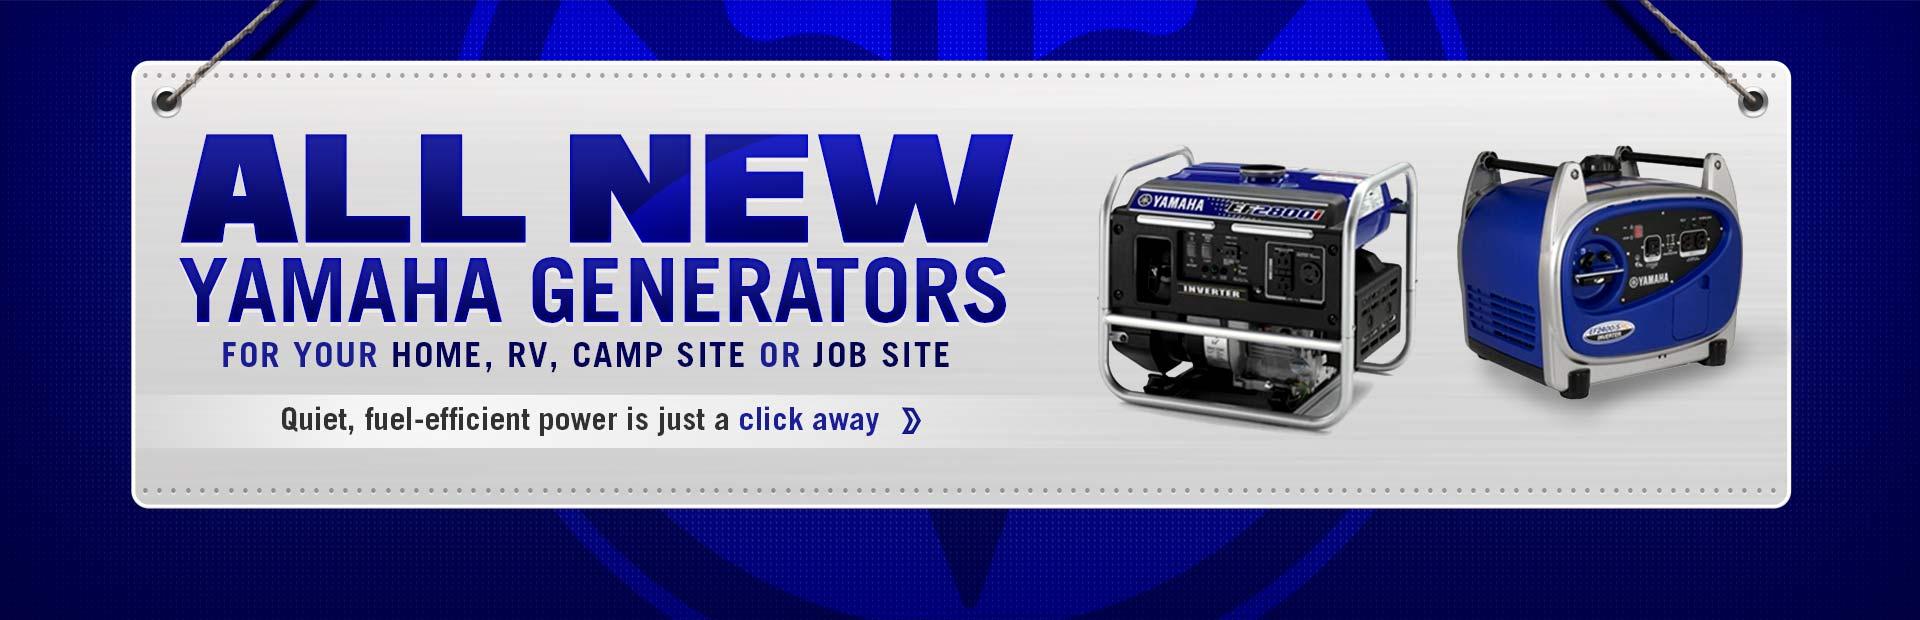 Click here to view new Yamaha generators.